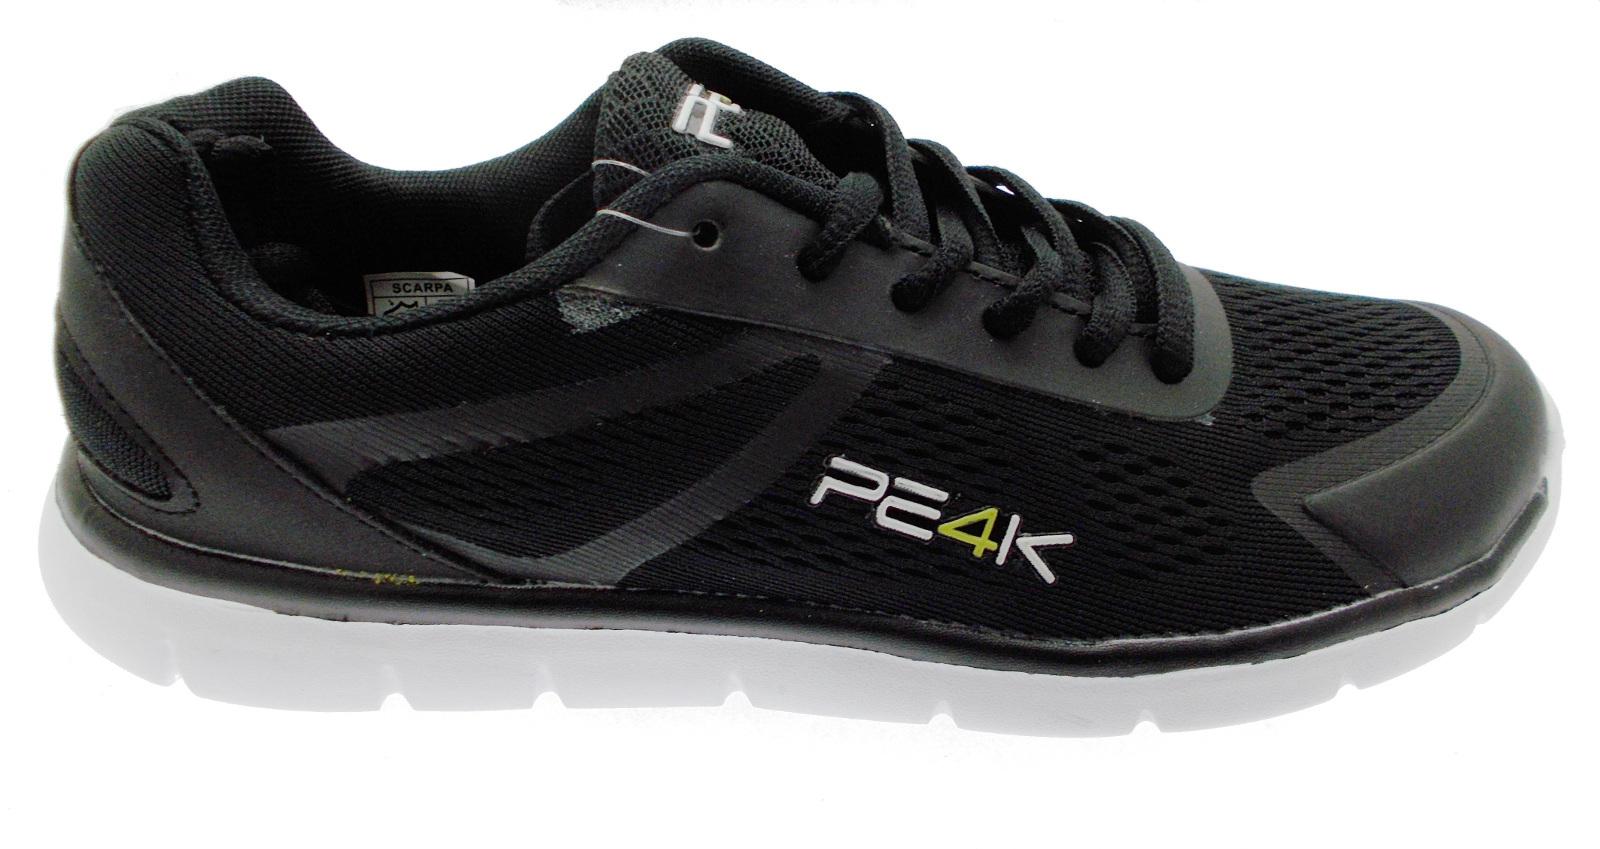 Art sneacker L10-S305B  sneacker Art  nero lacci plantare memory form PE4K 9103ba